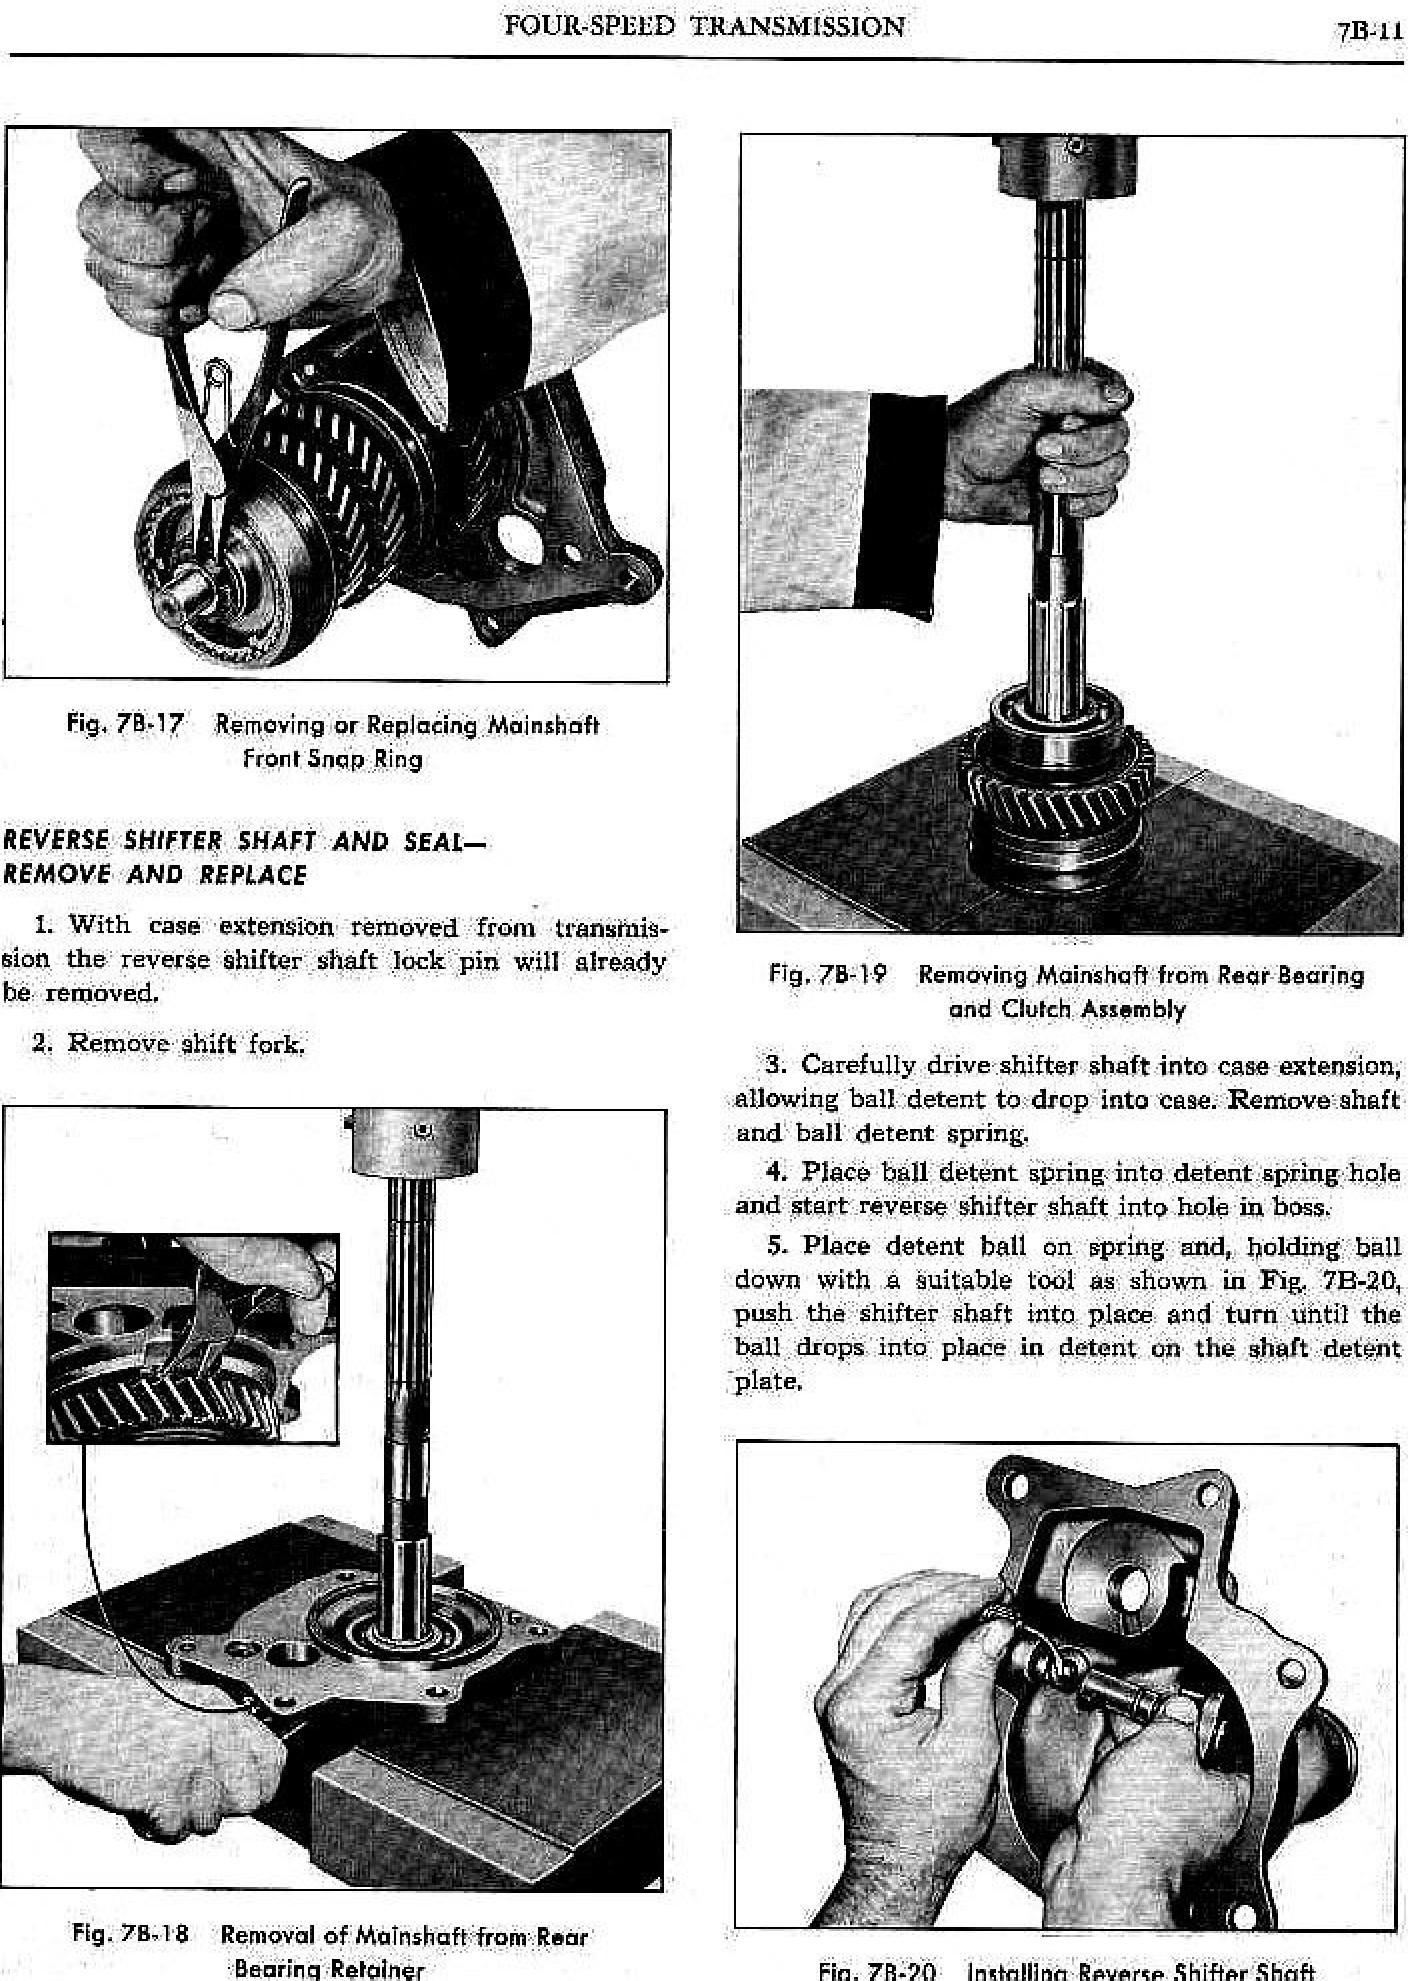 1961 Pontiac Shop Manual- 4-Speed Trans Page 11 of 20